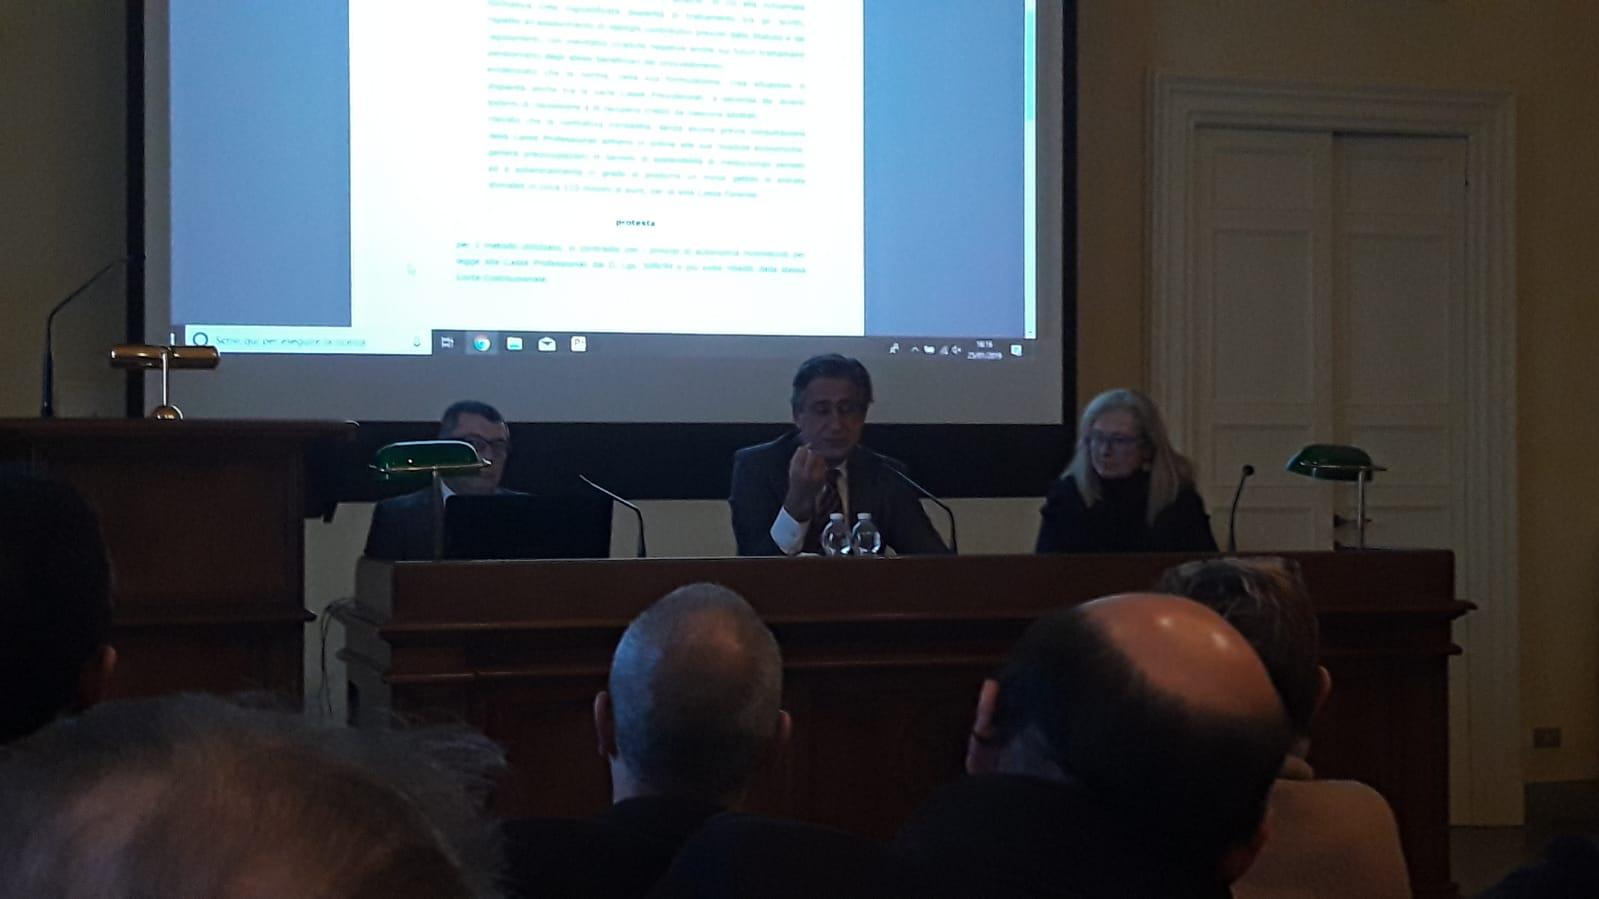 Convegno avvocati pavia Girolamo De Rada indagini difensive